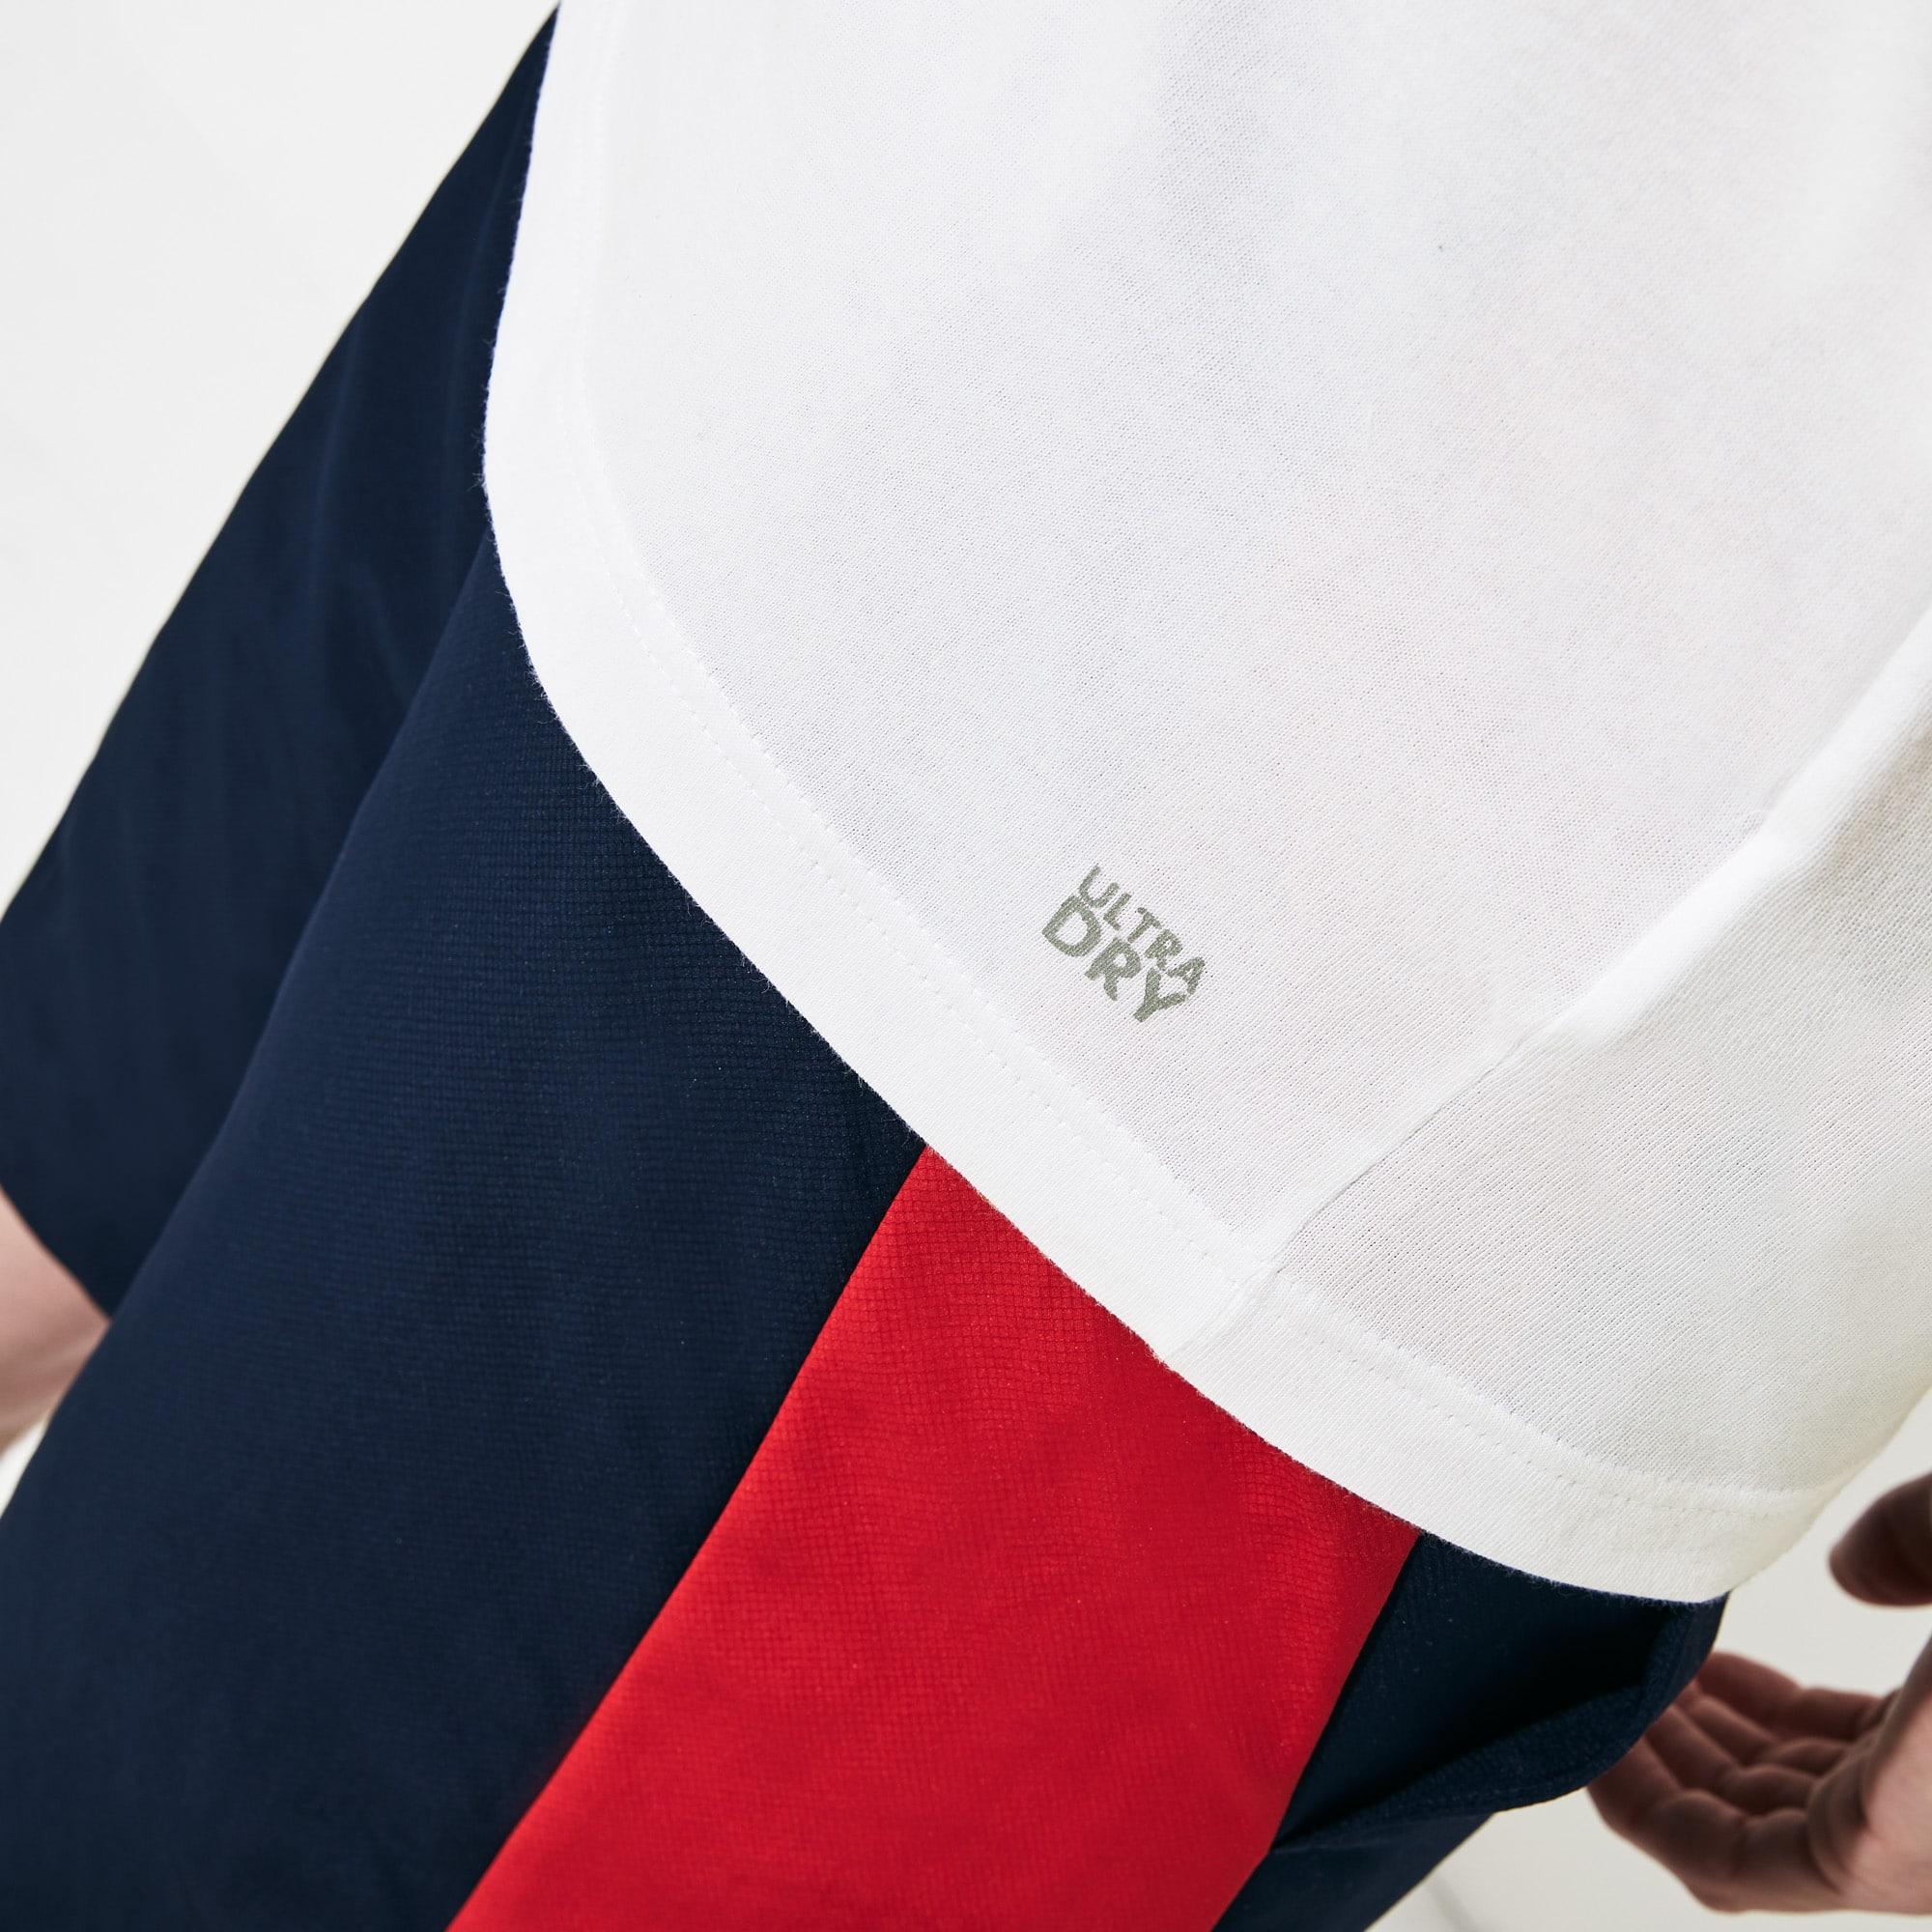 Lacoste - Camiseta Tenis Lacoste SPORT De Punto Técnico Con Cocodrilo Oversized - 4